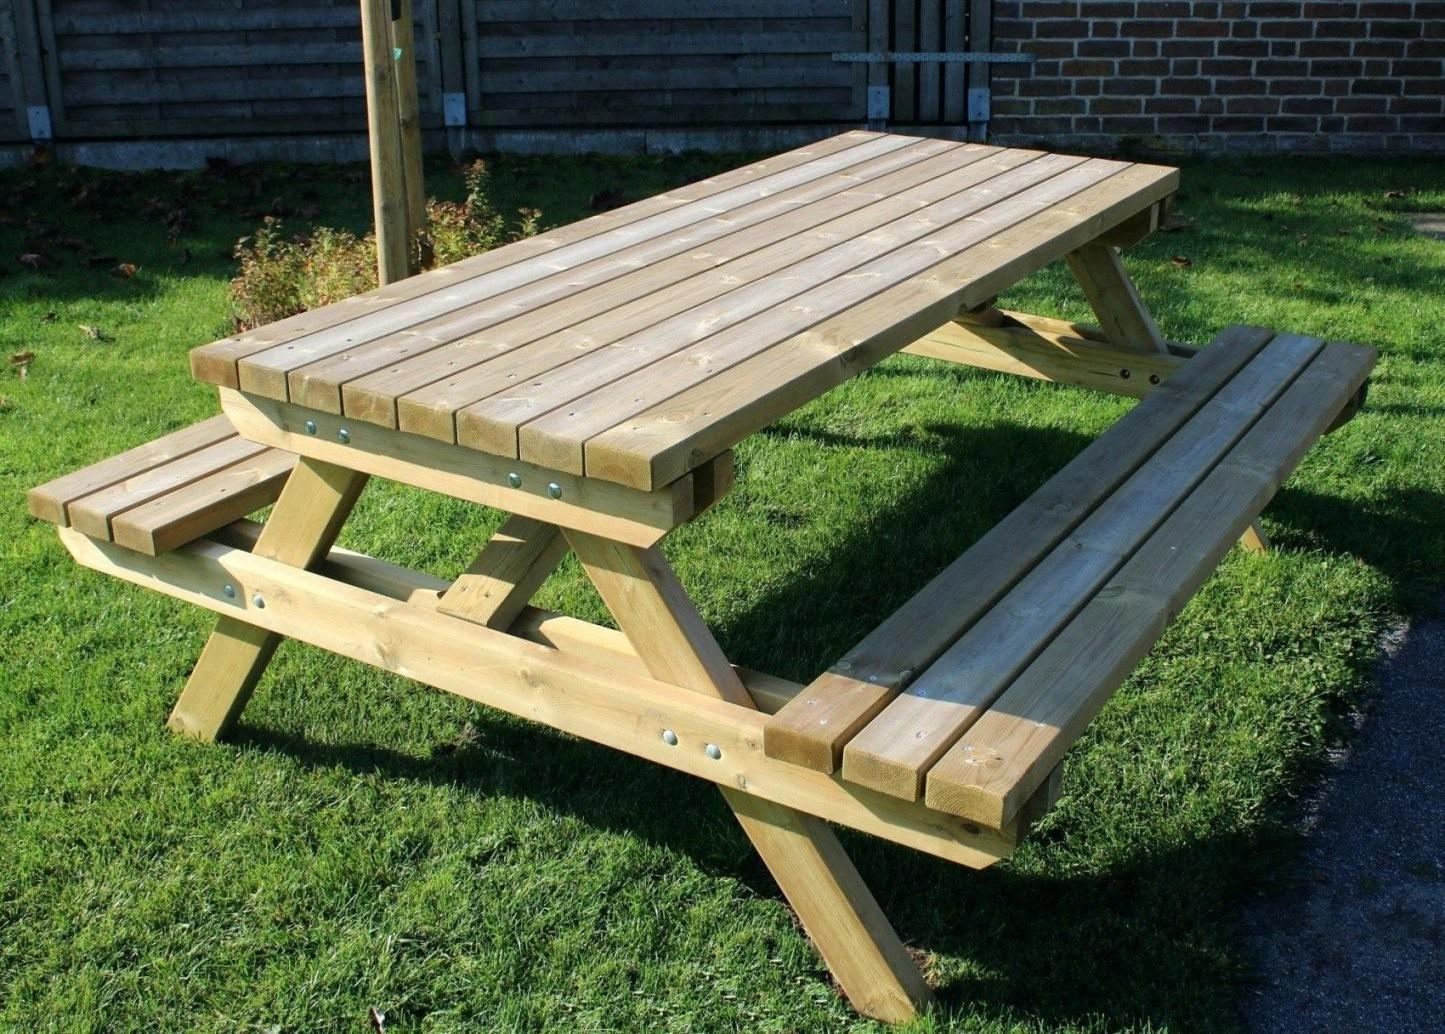 Bank Tisch Kombination Feinste Sitzbank Kinder Garten Lax Gartenbank von Sitzbank Kind Garten Bild